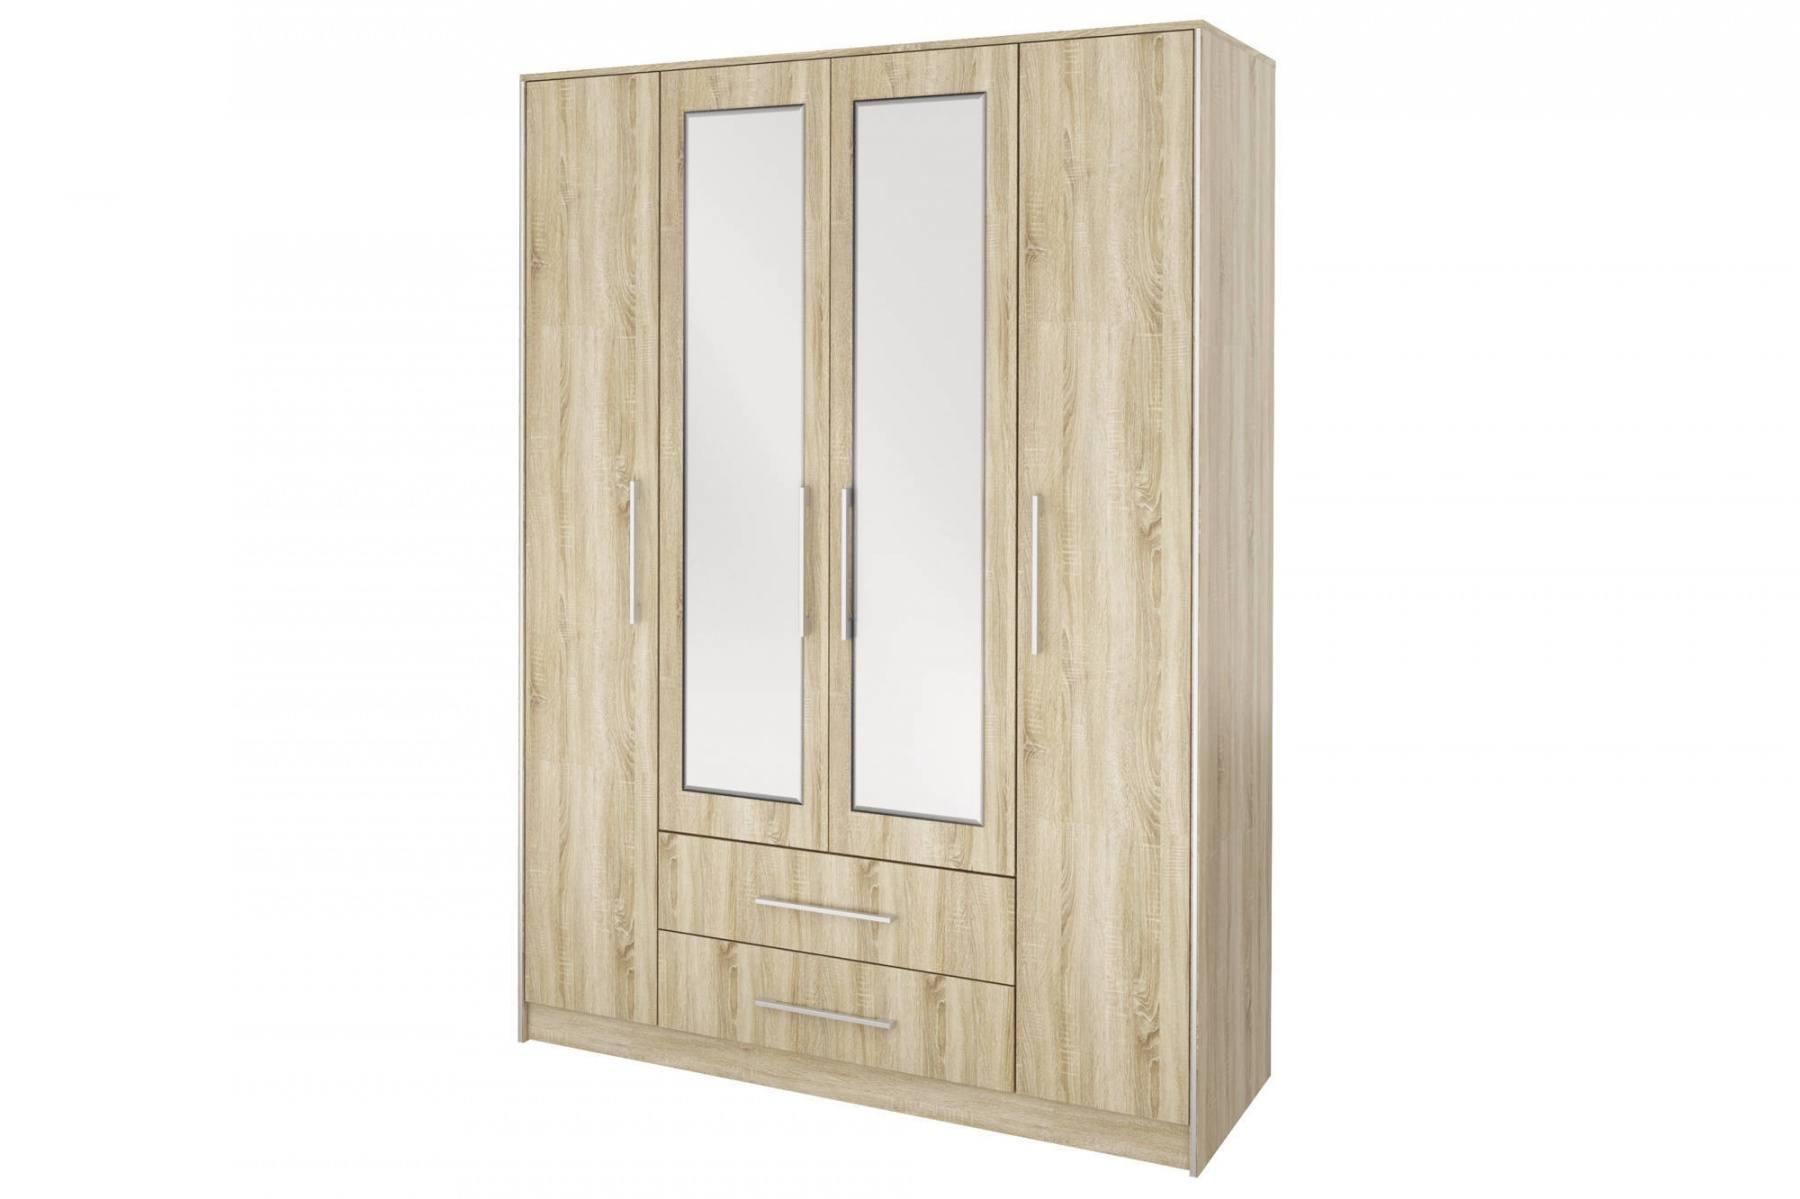 Шкаф 4-х дв. с зеркалами Сиеста СТЛ.138.01 шкаф 4 х дв с зеркалами скуп